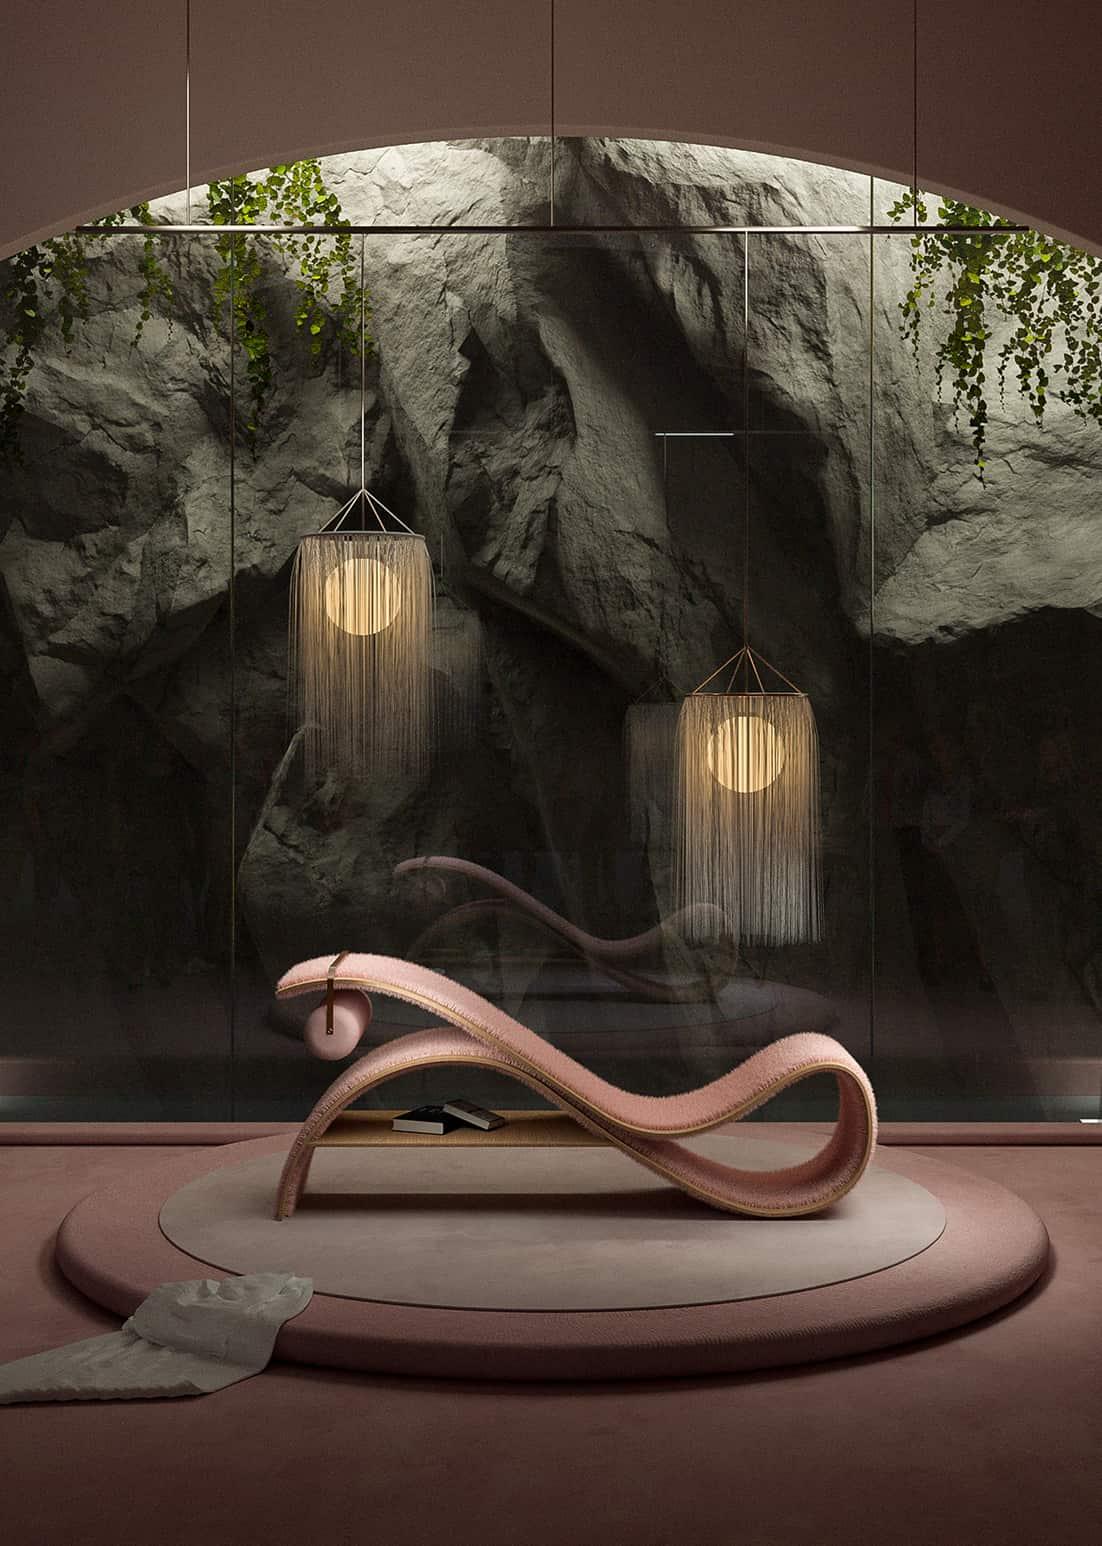 Loftgarten Towel Chair by Paul Milinski